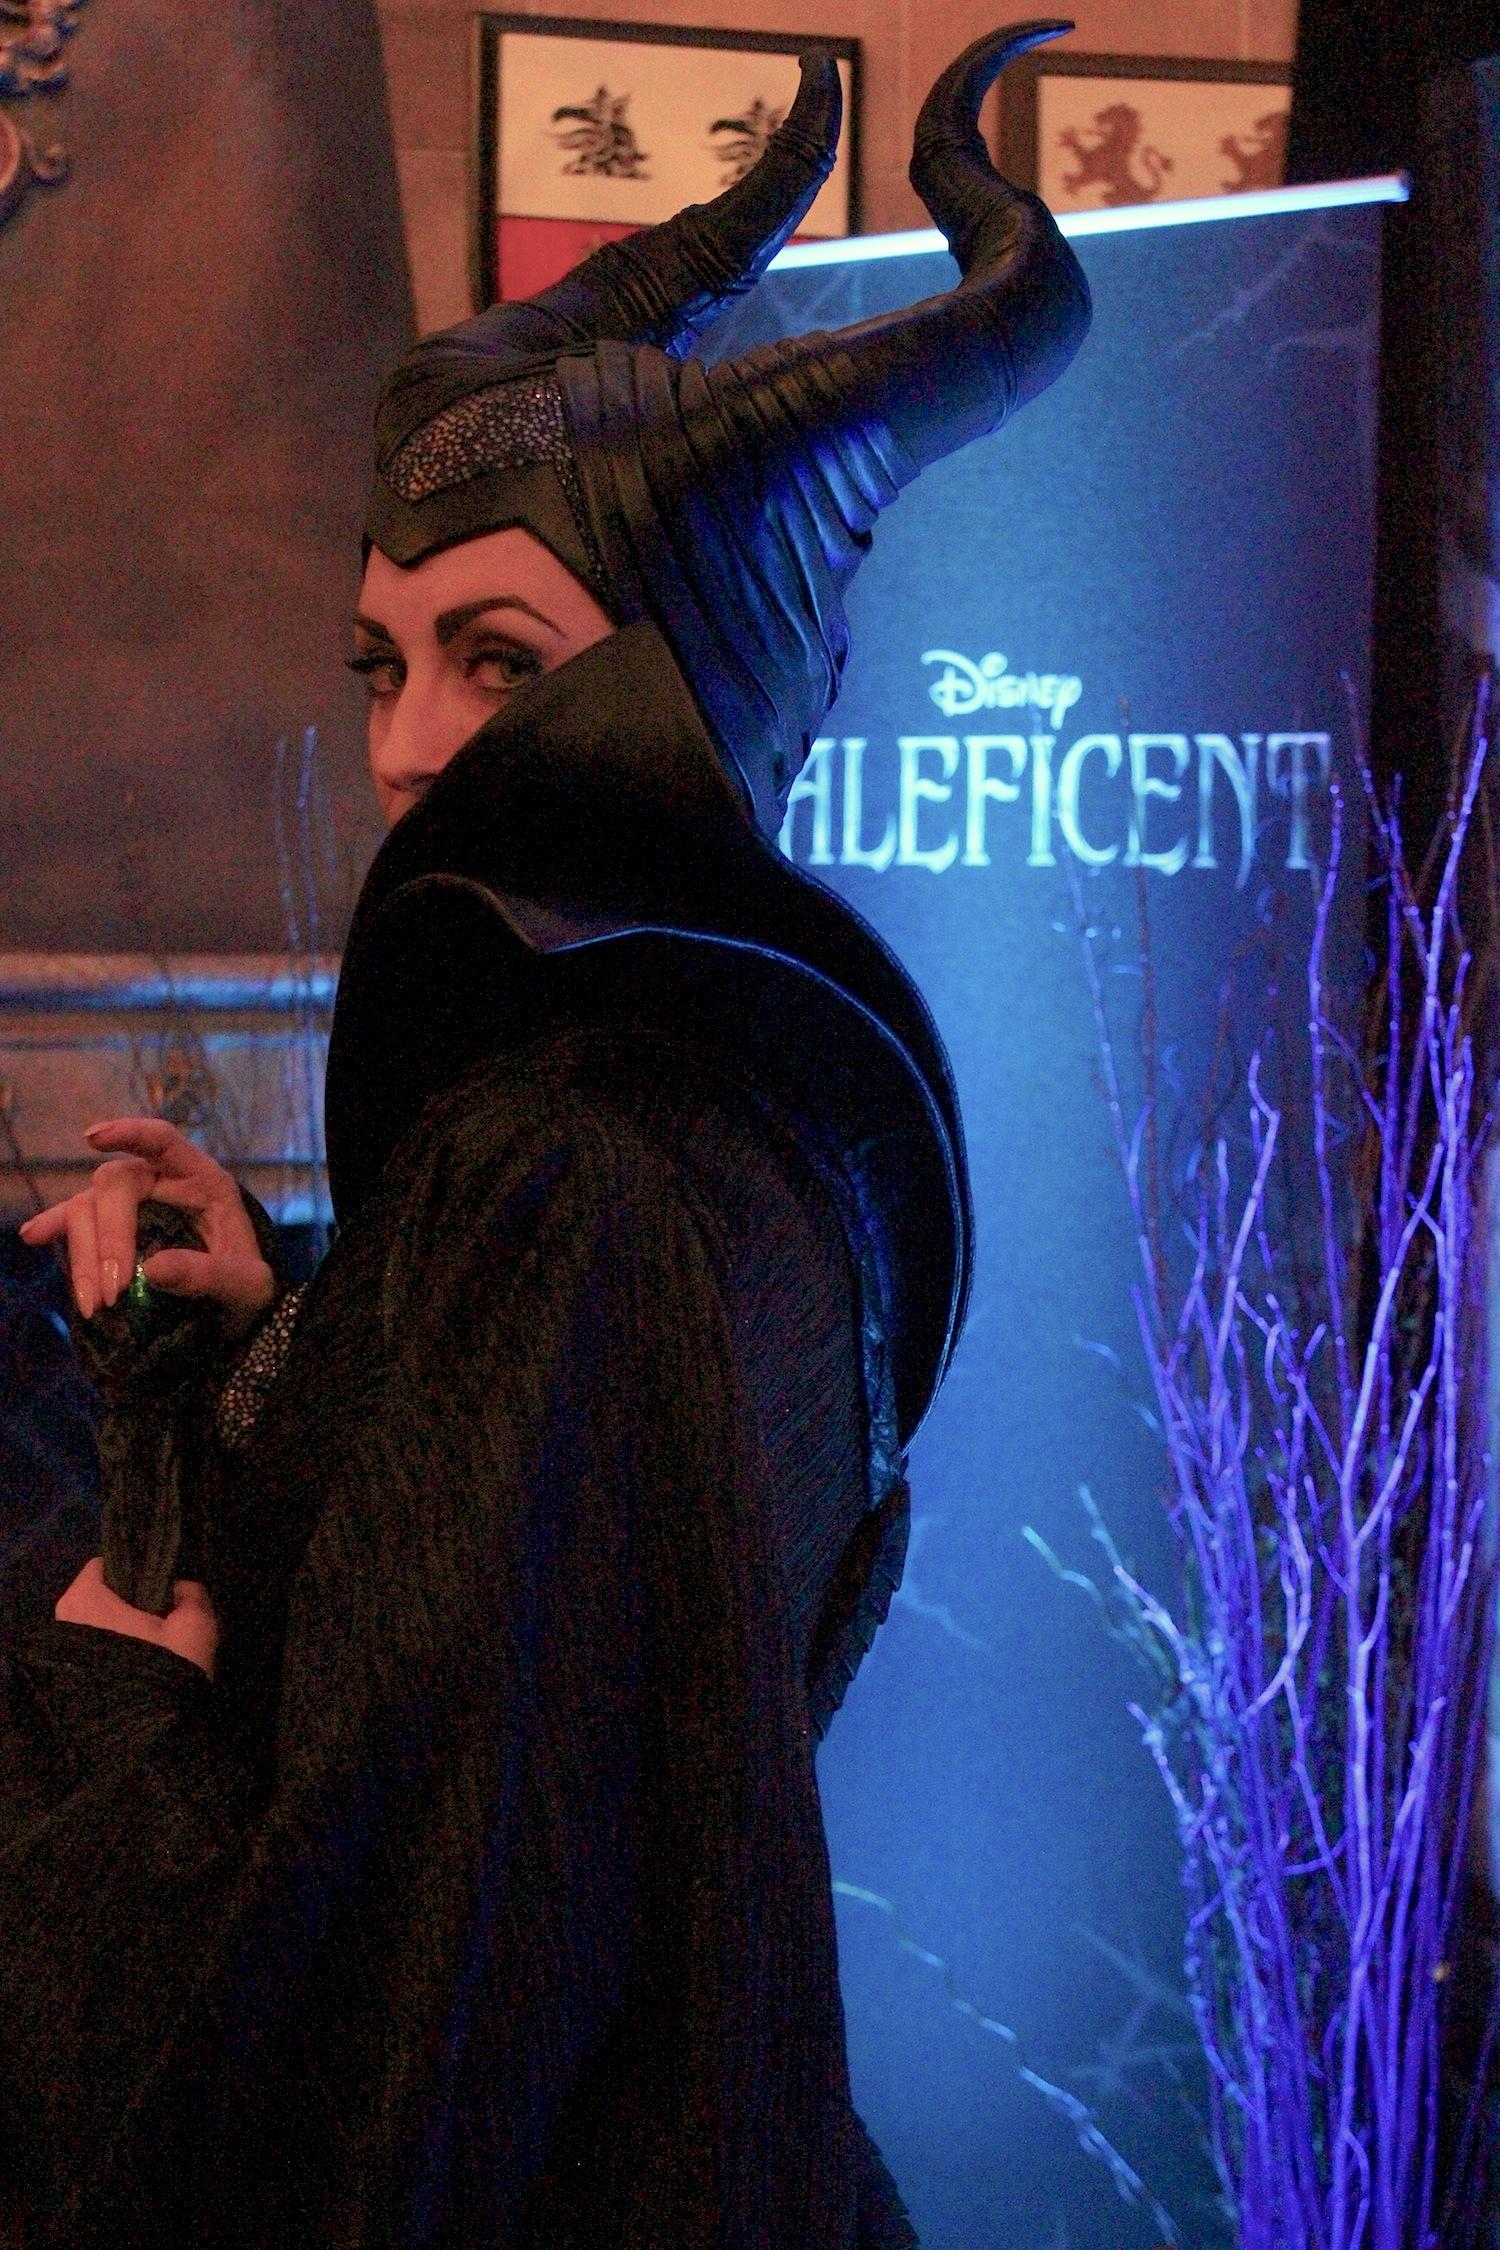 Disney parks new maleficent movie face character greets lucky guests disney parks new maleficent movie face character greets lucky guests in cinderella castle at magic kingdom experiencethemistress m4hsunfo